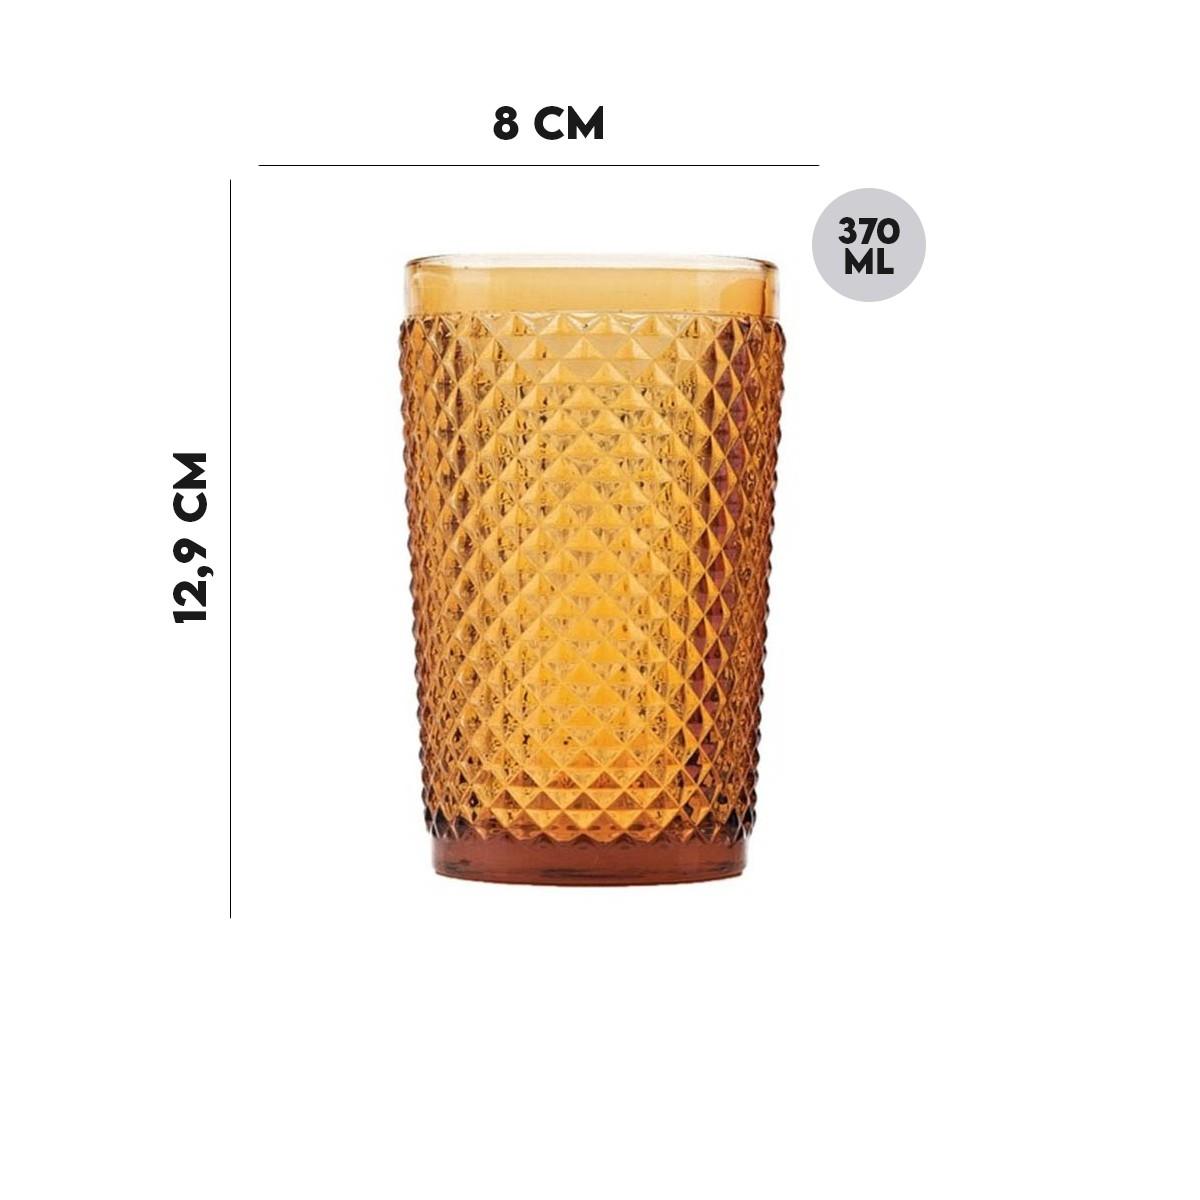 Copo Alto Sodo Cálcico Âmbar 370 ml  - Lemis